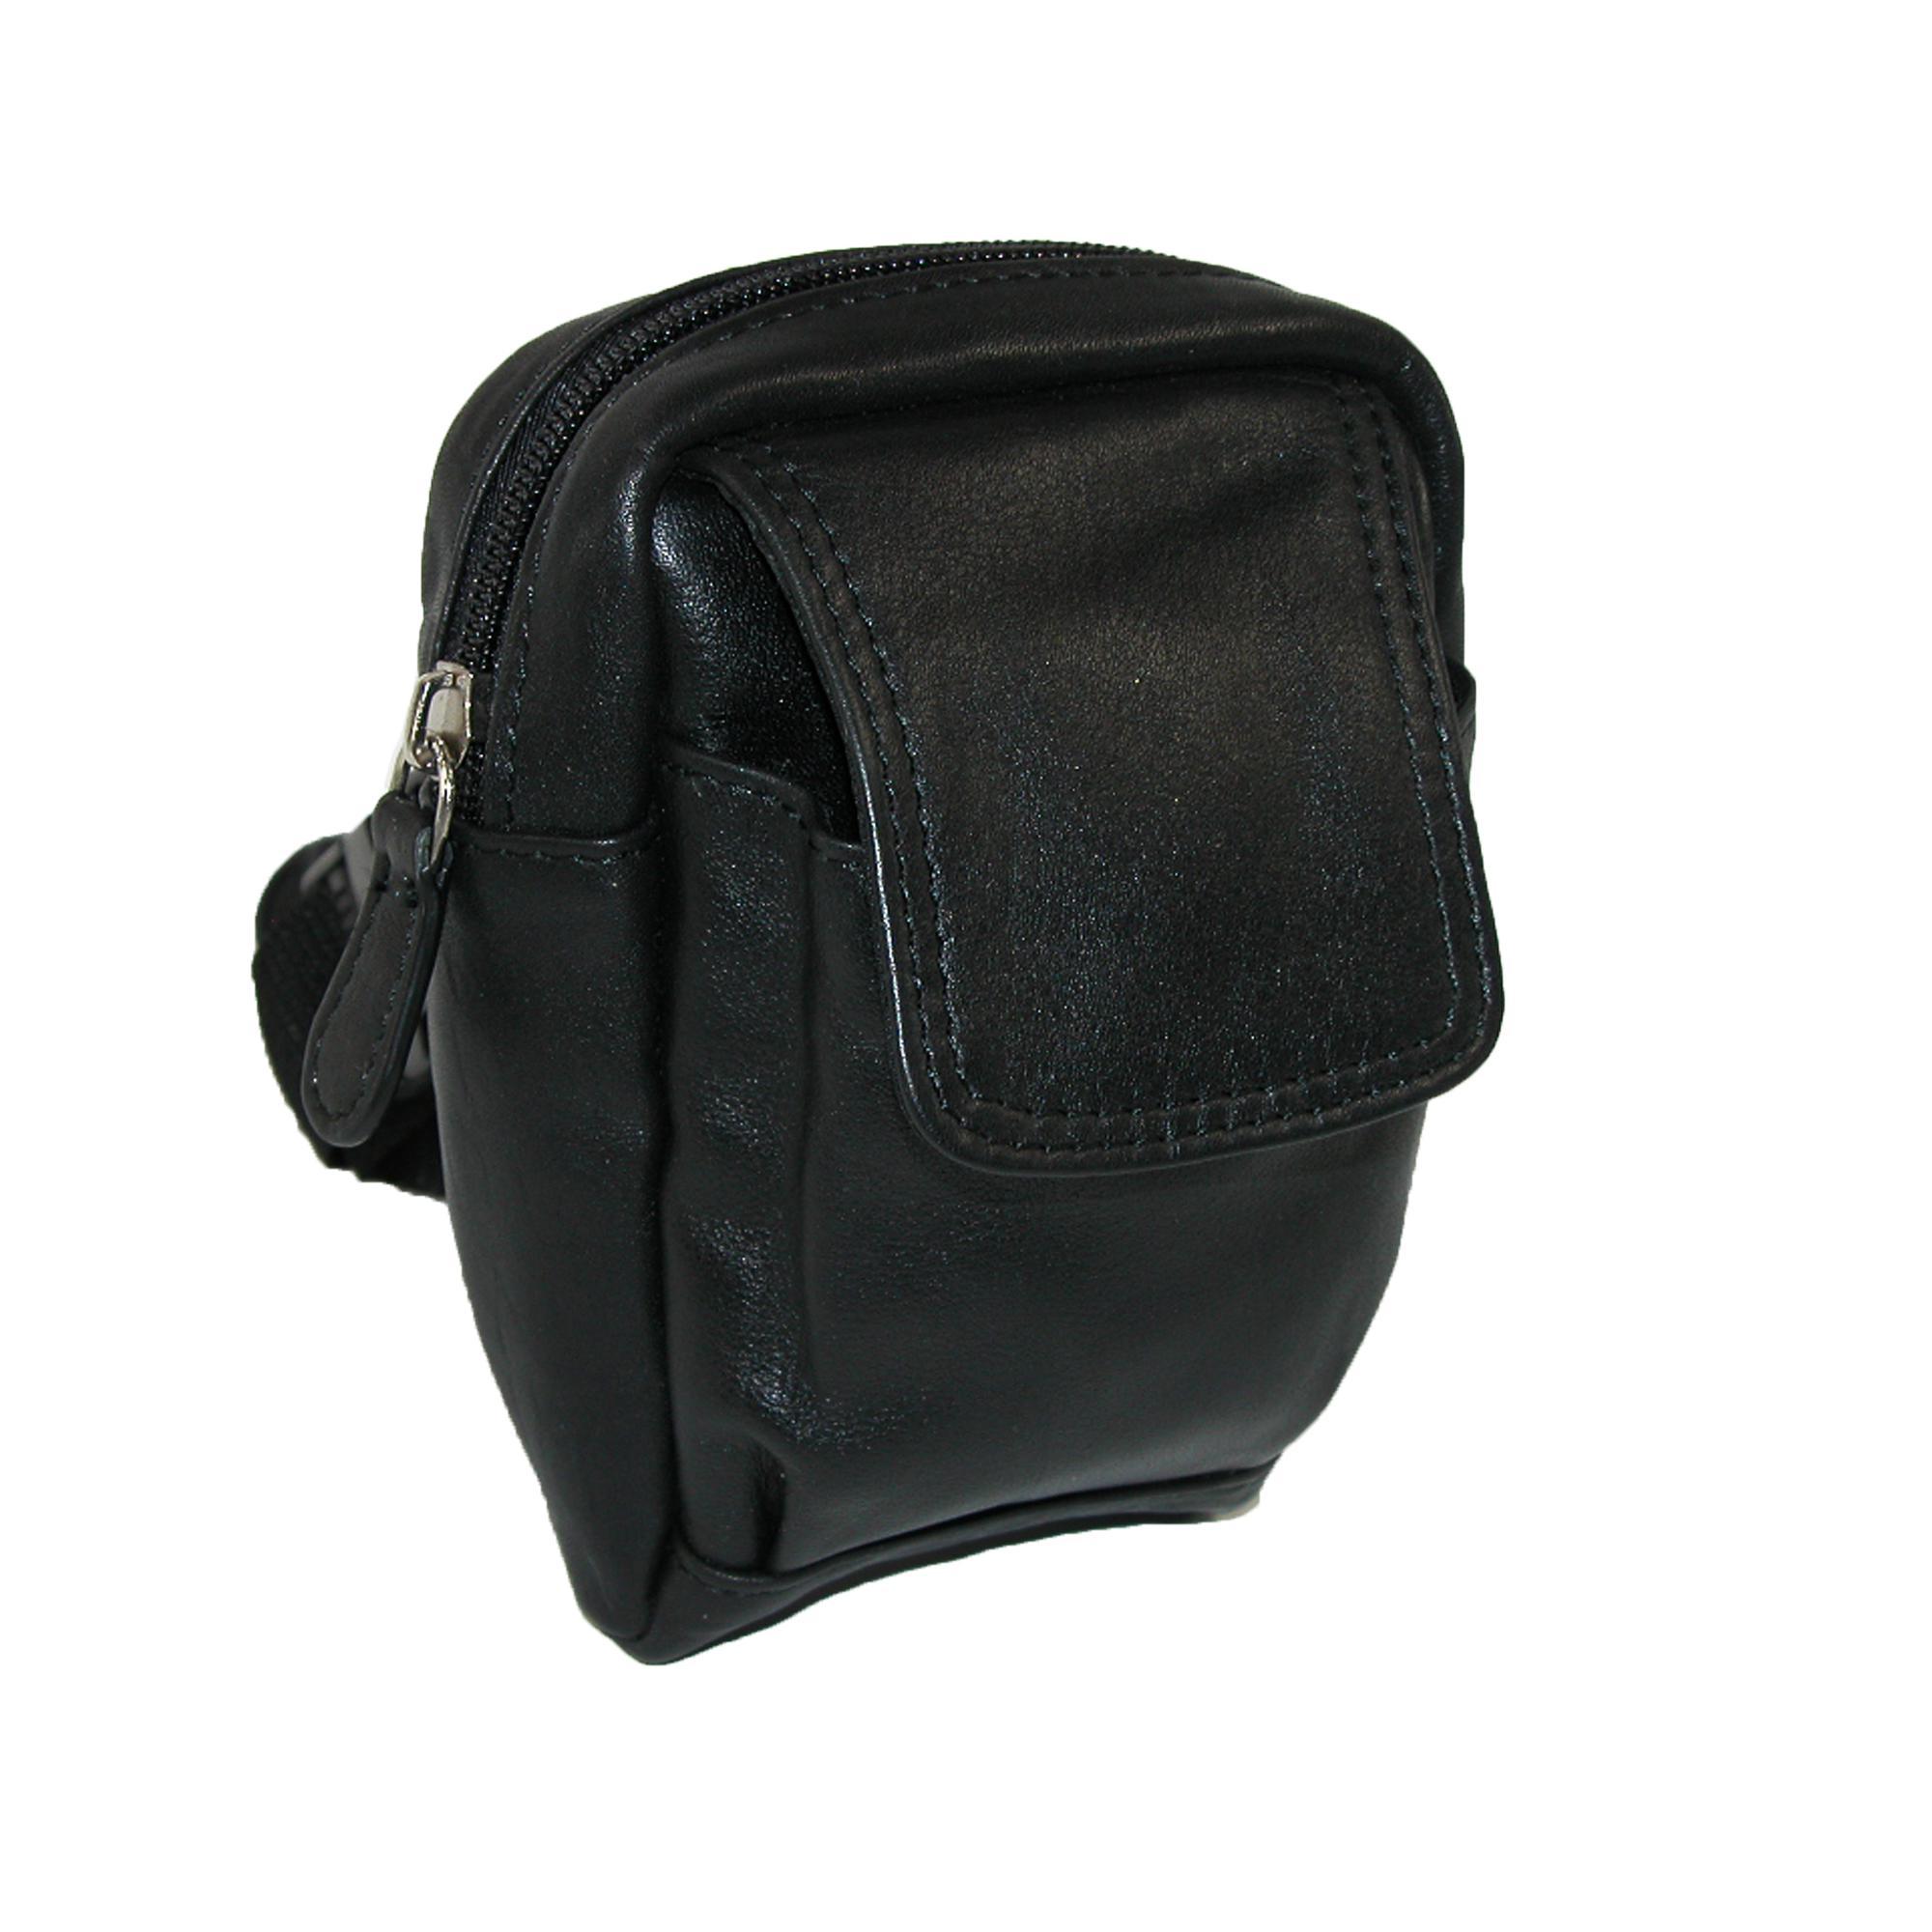 Winn International Leather Mini Belt Bag